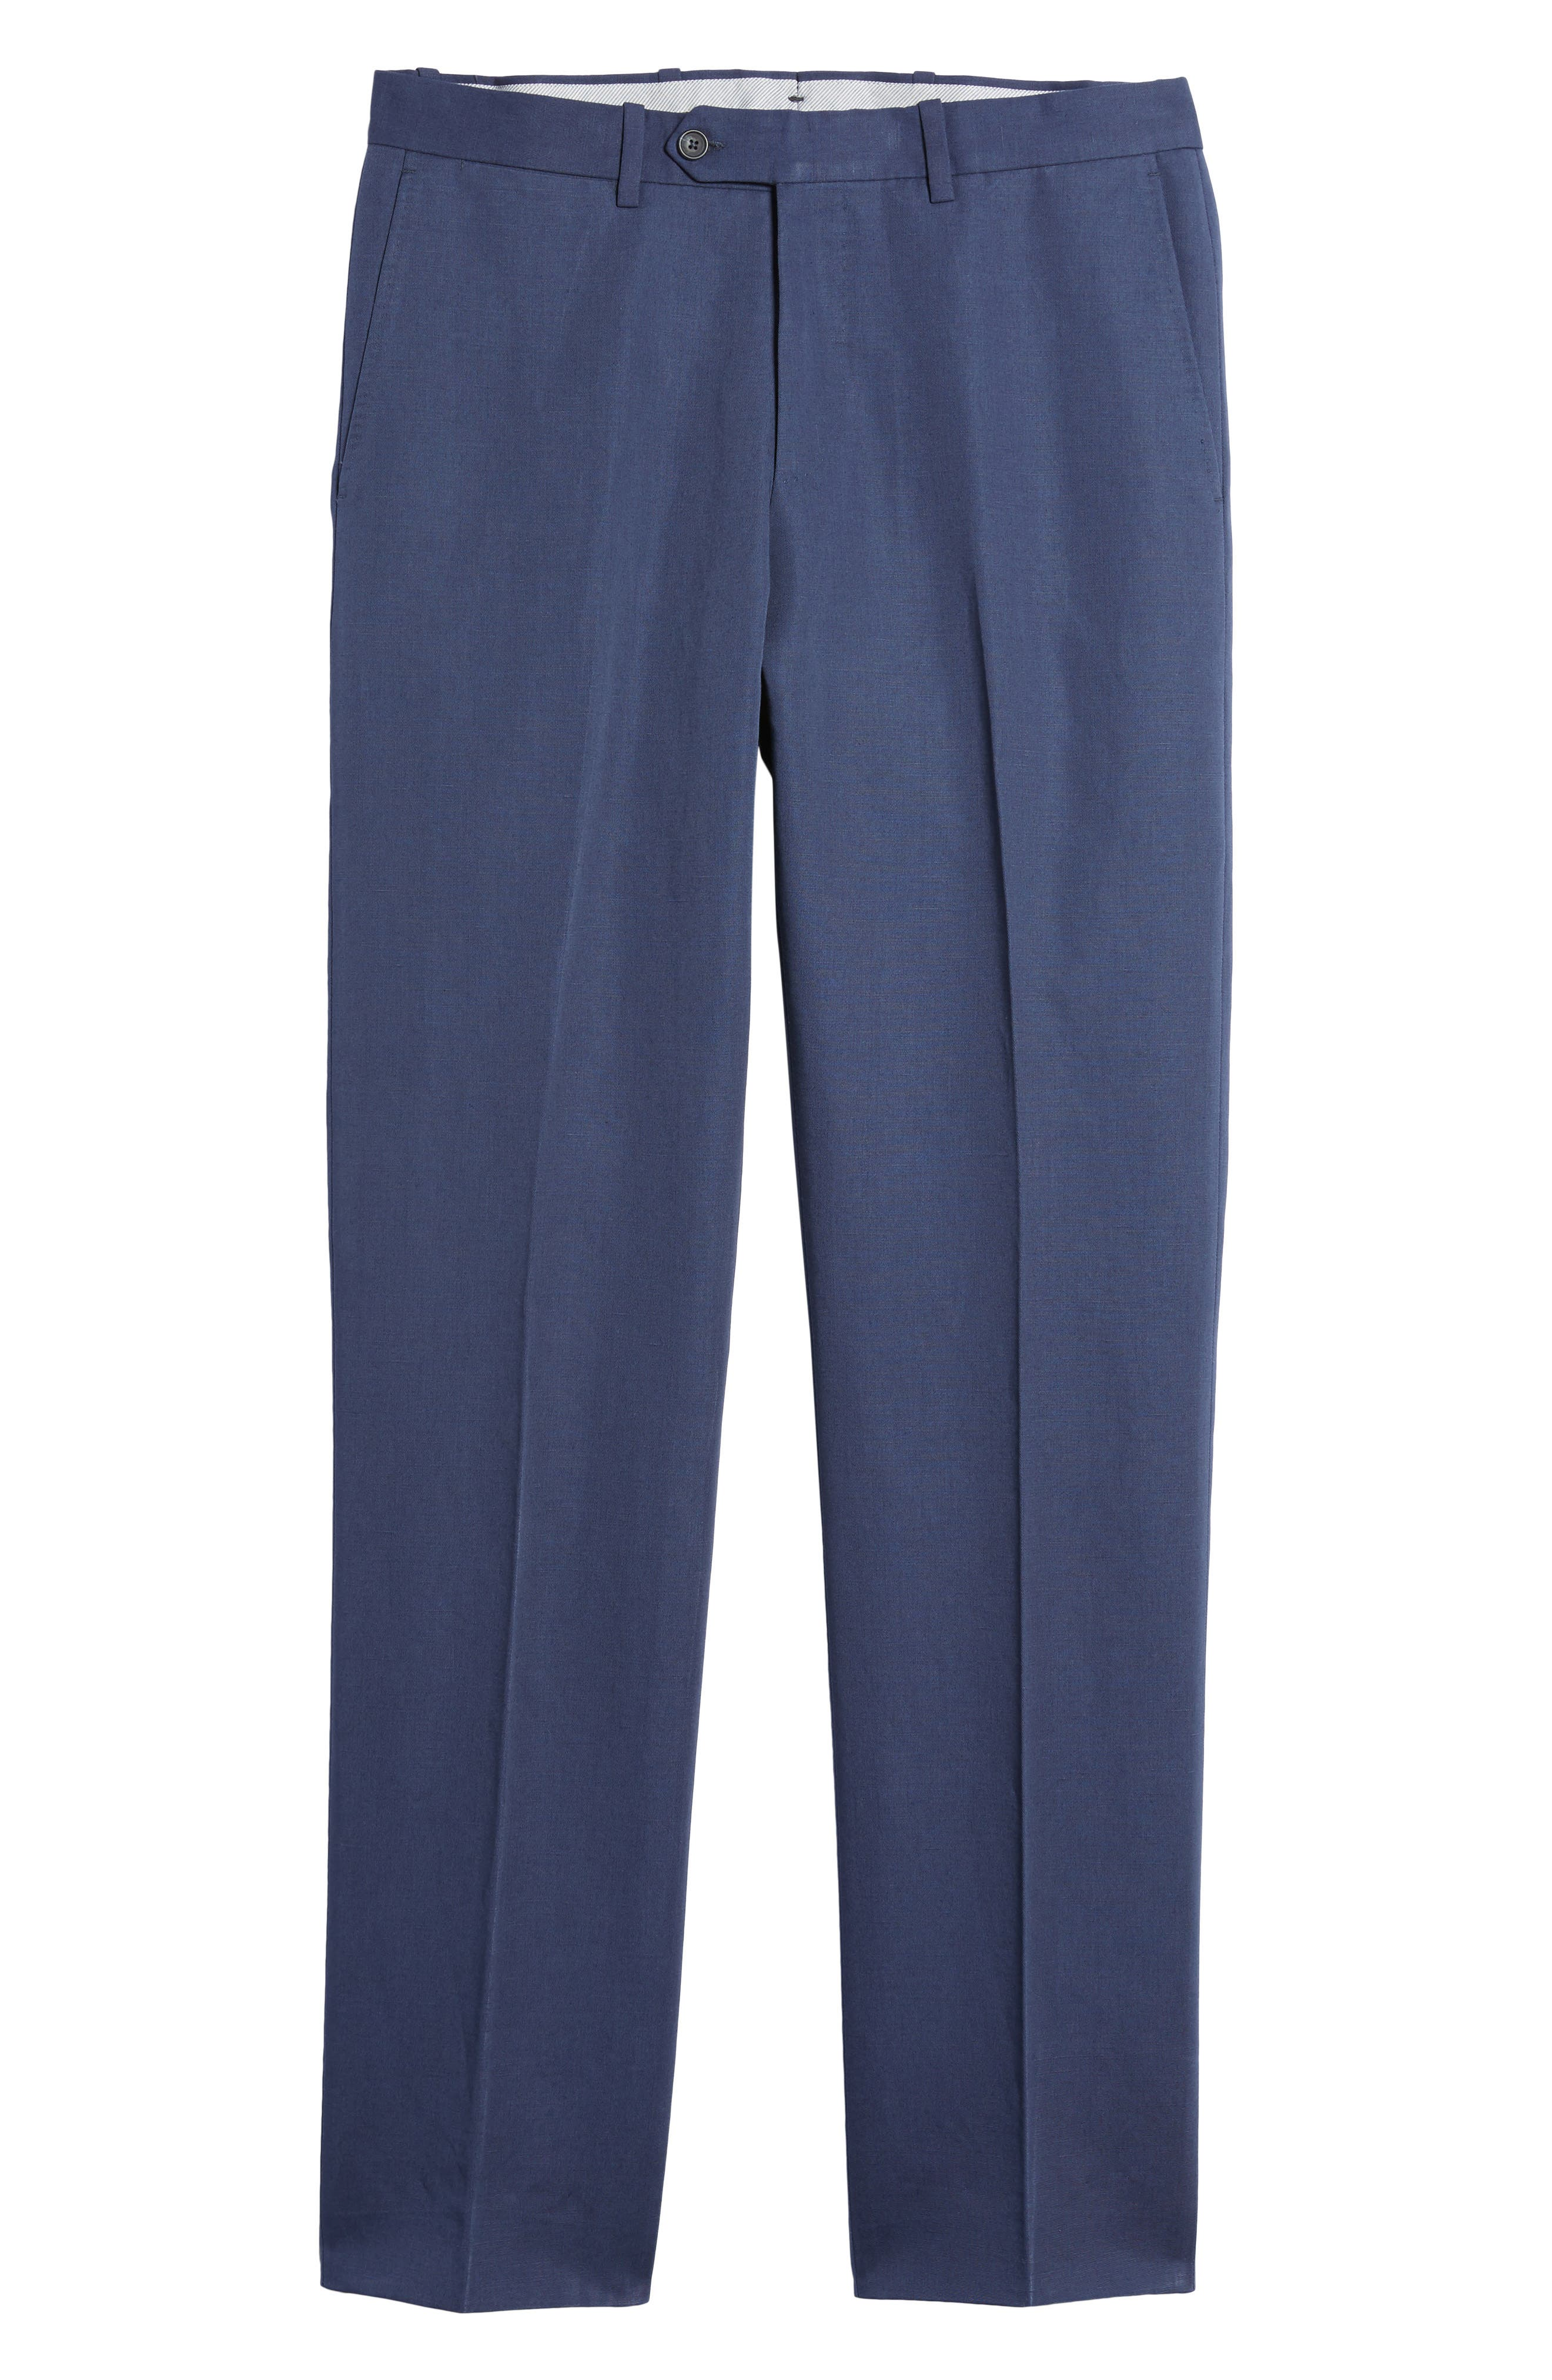 Flat Front Solid Cotton & Linen Trousers,                             Alternate thumbnail 24, color,